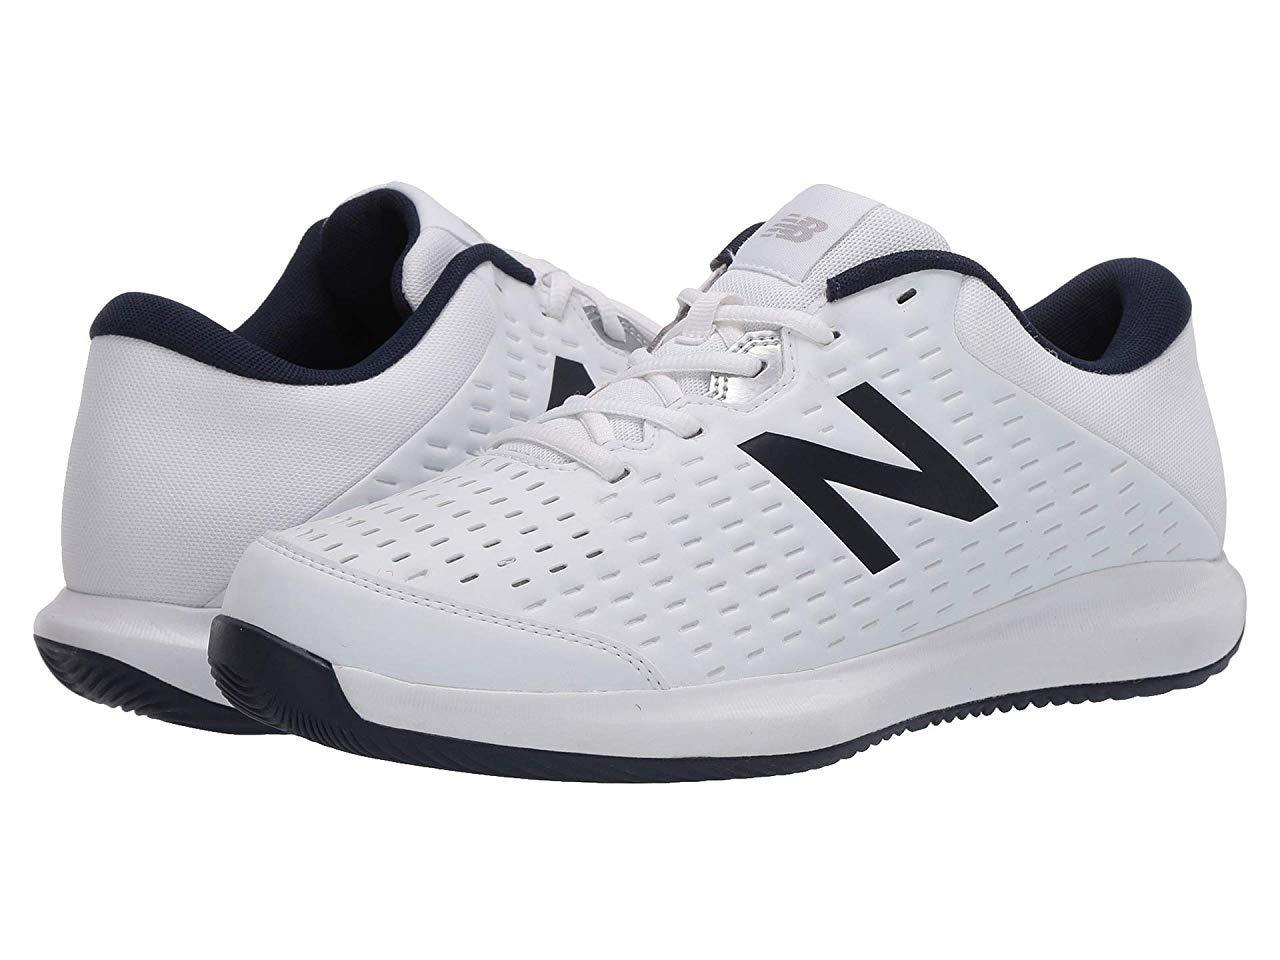 Кроссовки/Кеды New Balance 696v4 White/Pigment